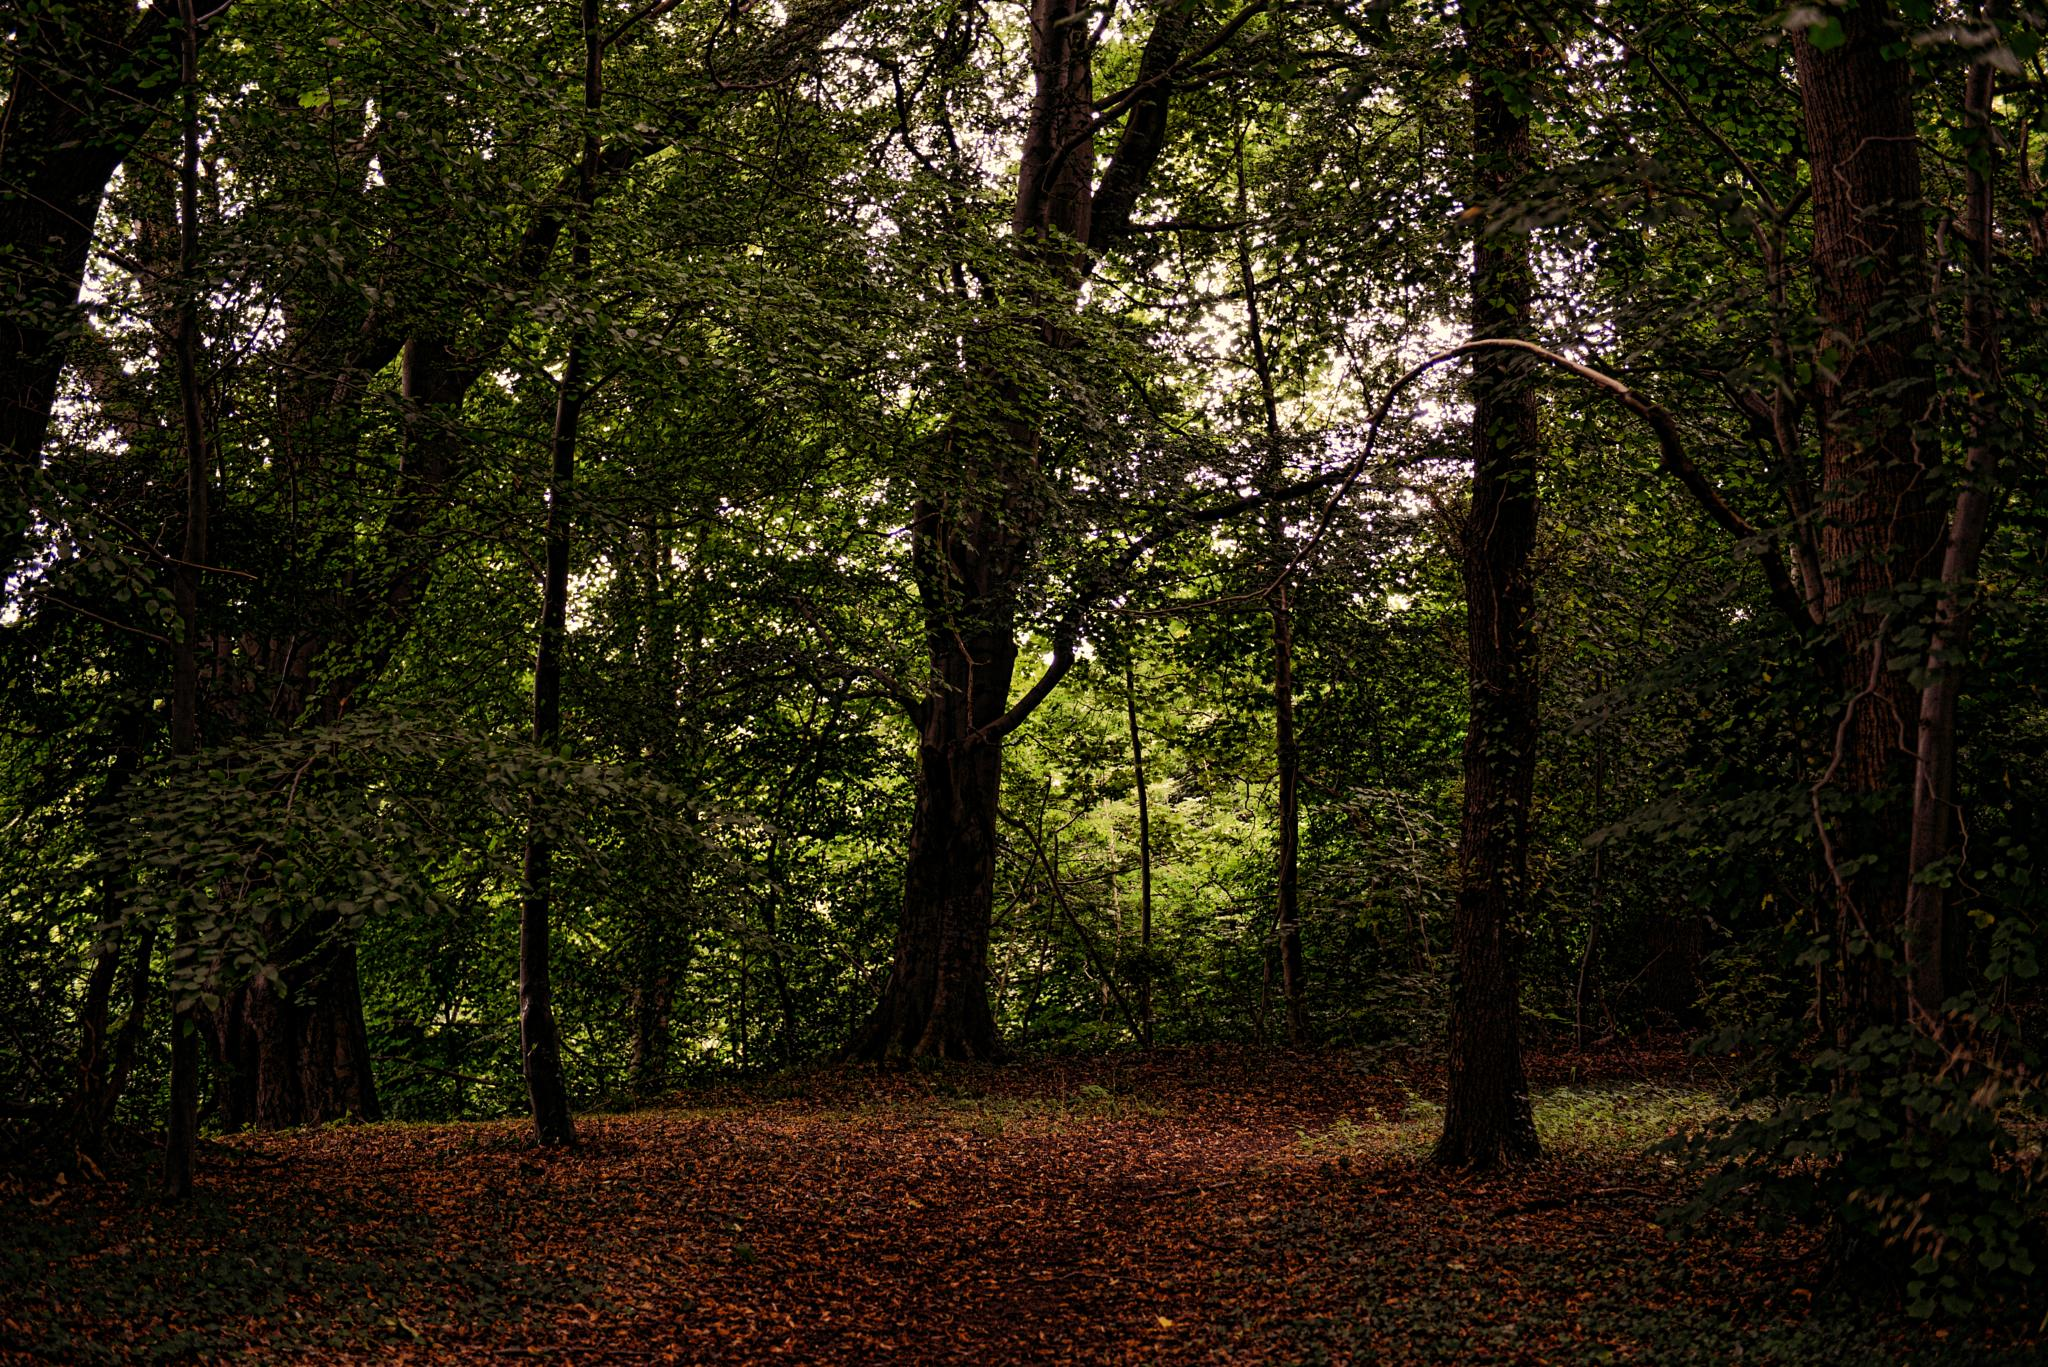 Wooded Glen, Midlothian, Scotland by Ann